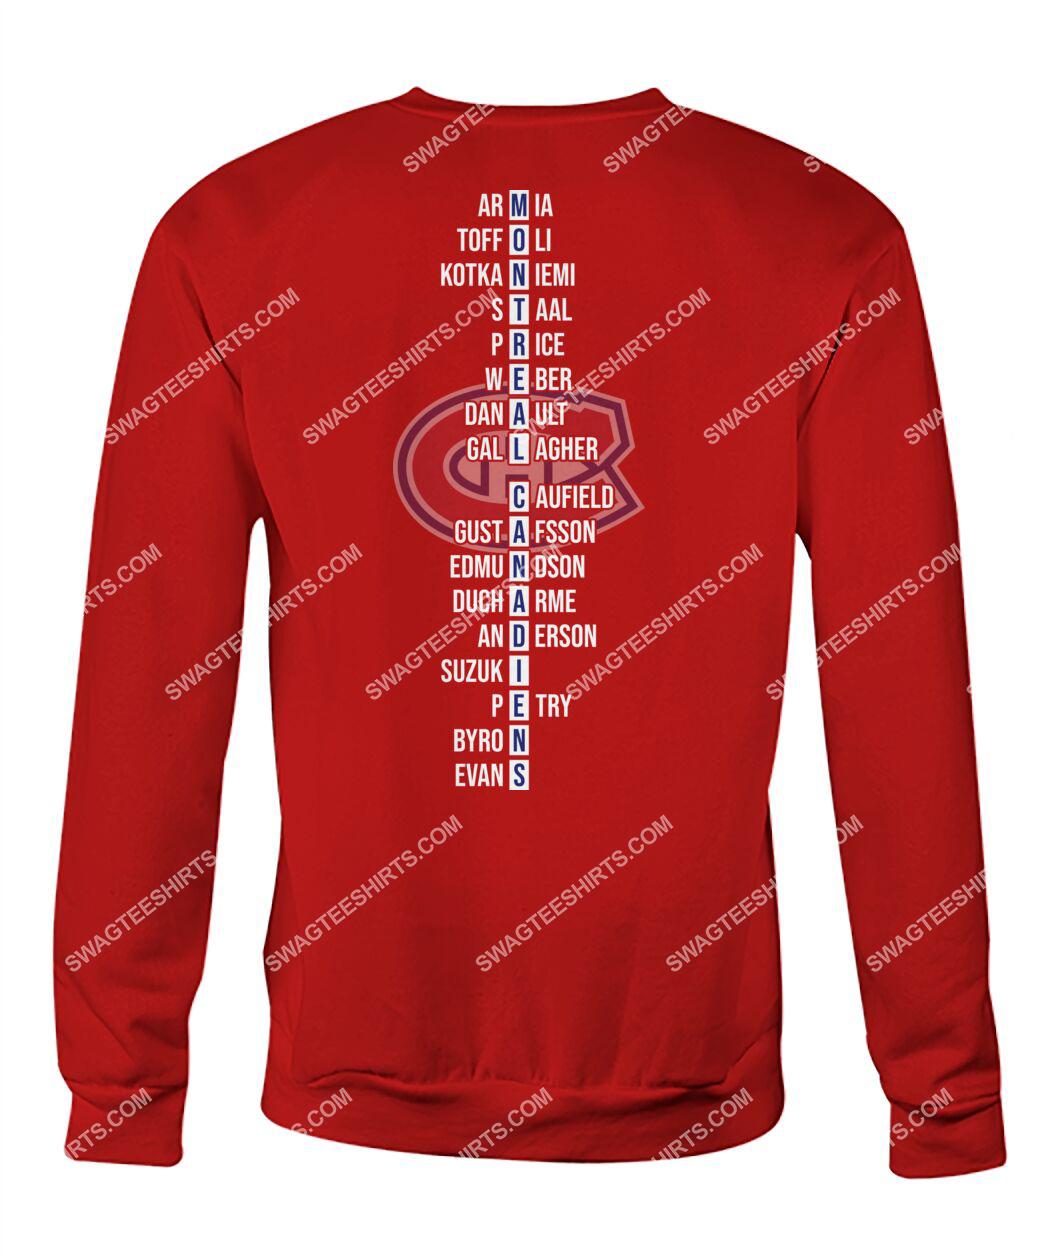 montreal canadiens 2021 north division champions sweatshirt - back 1